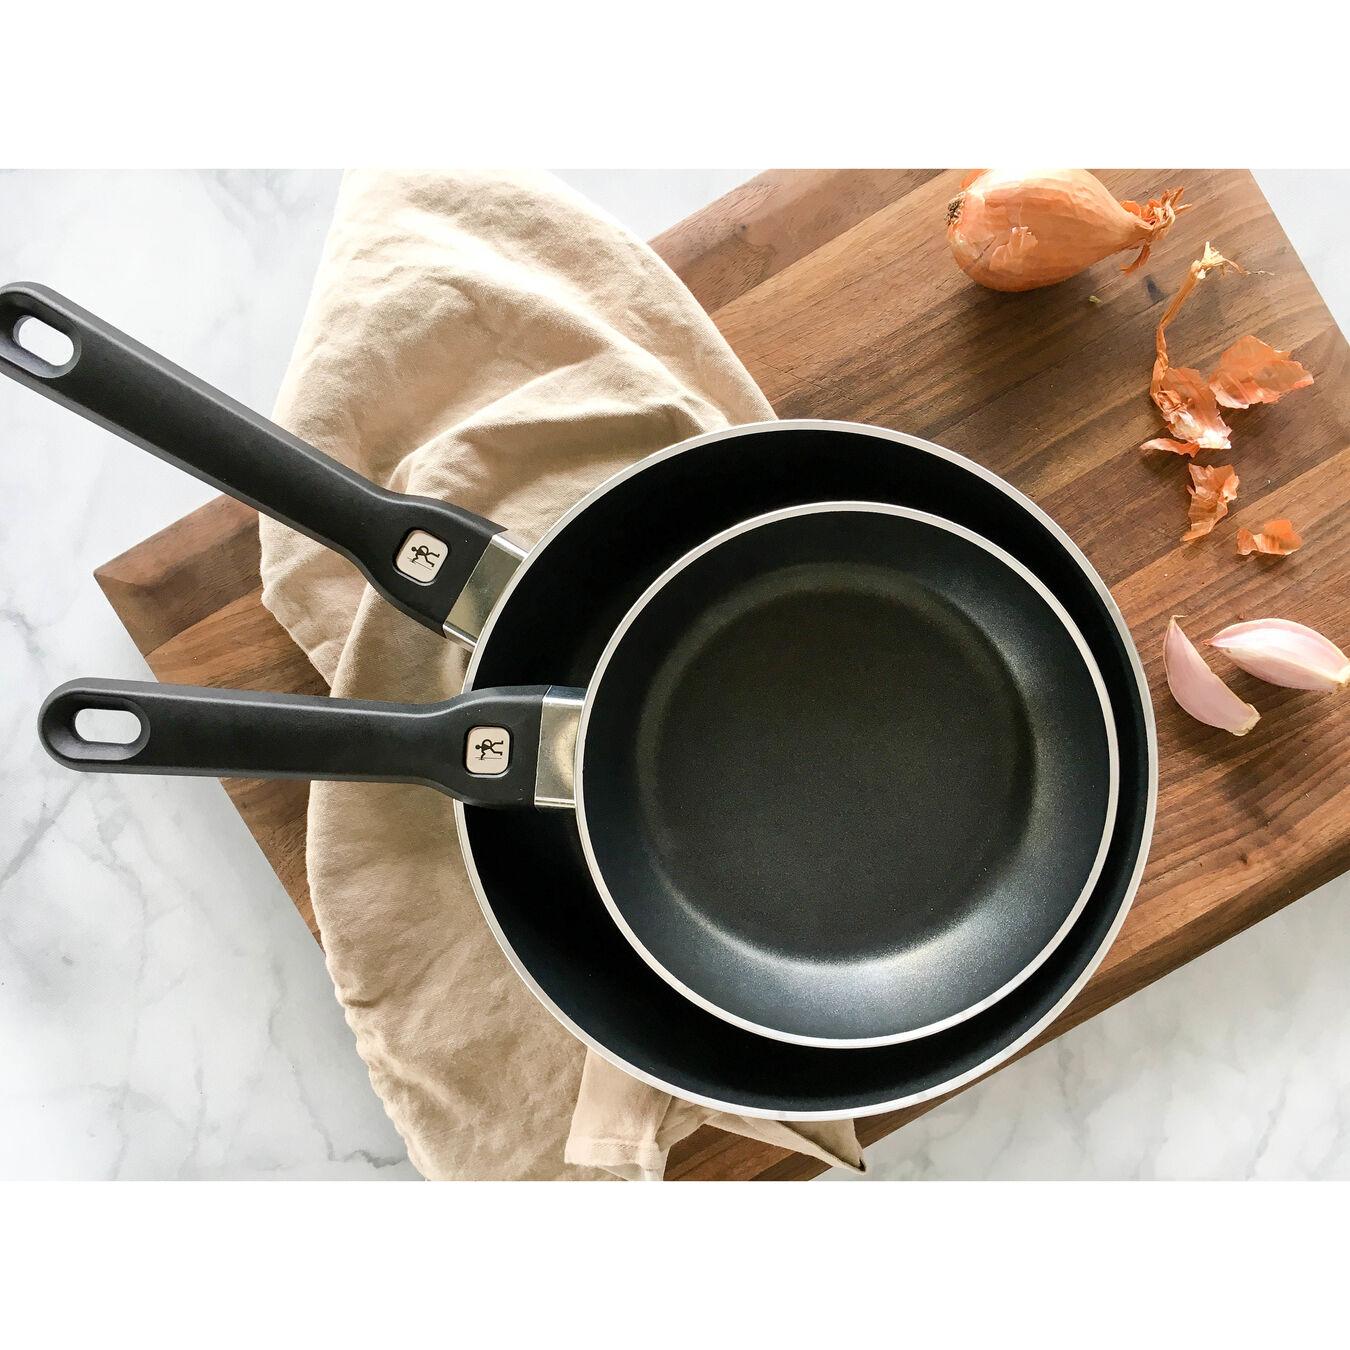 2-pc Aluminum Nonstick Fry Pan Set - Black,,large 4